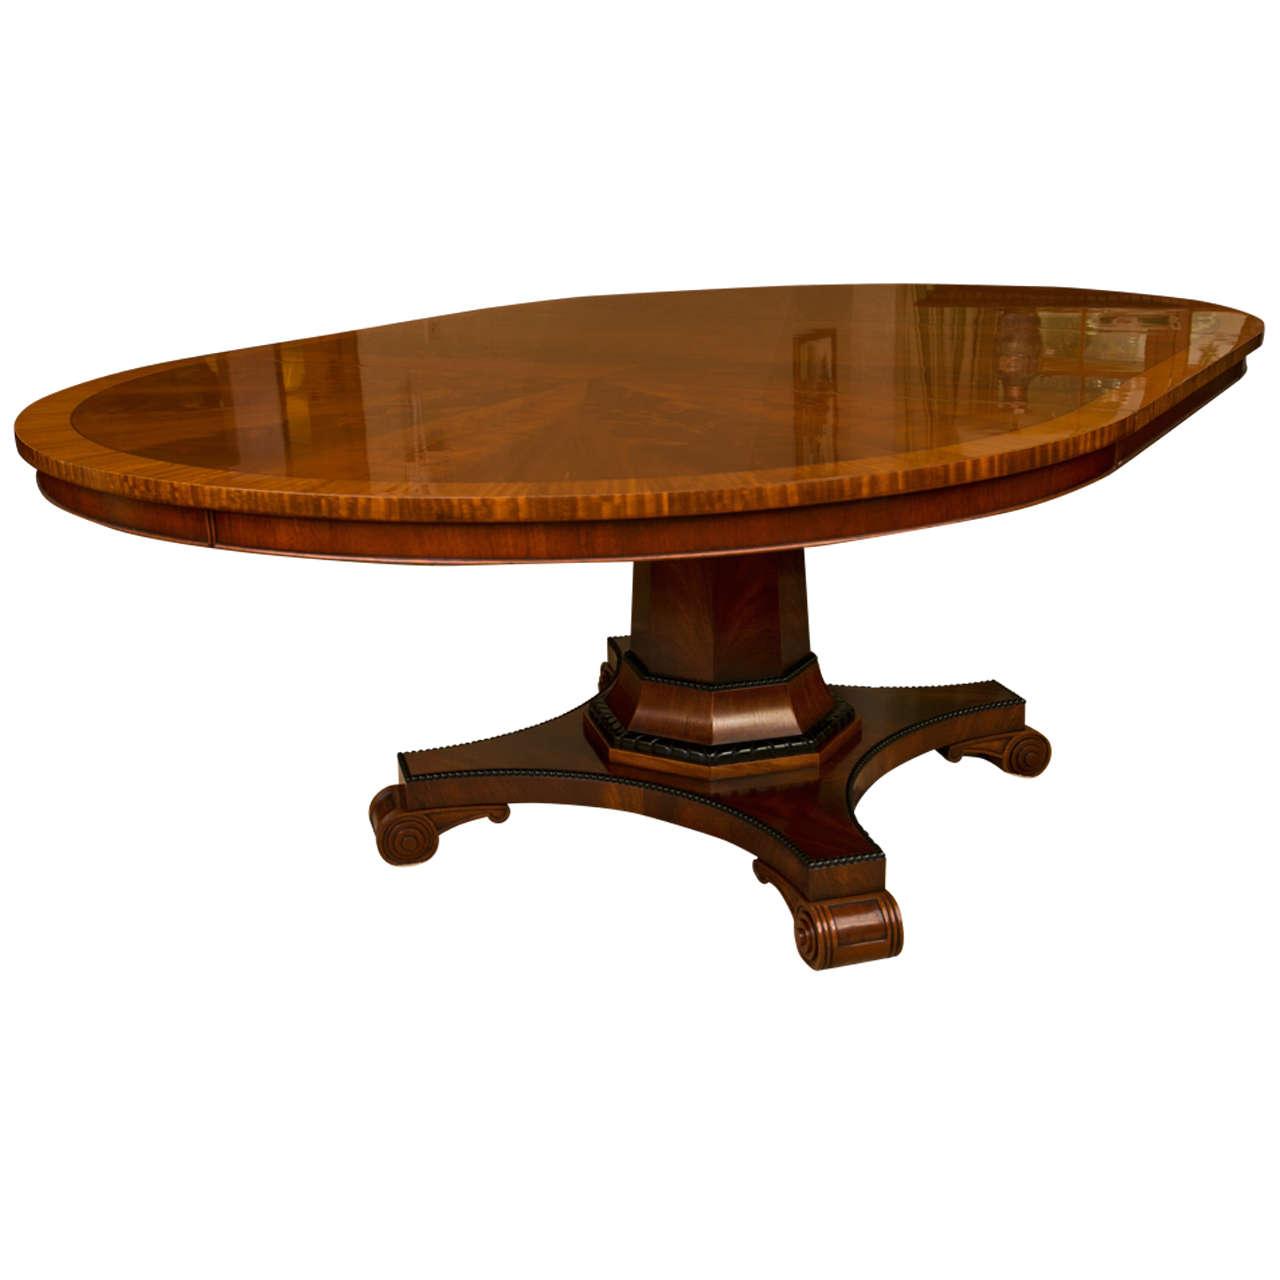 Custom regency style circular mahogany dining table for for Mahogany dining table